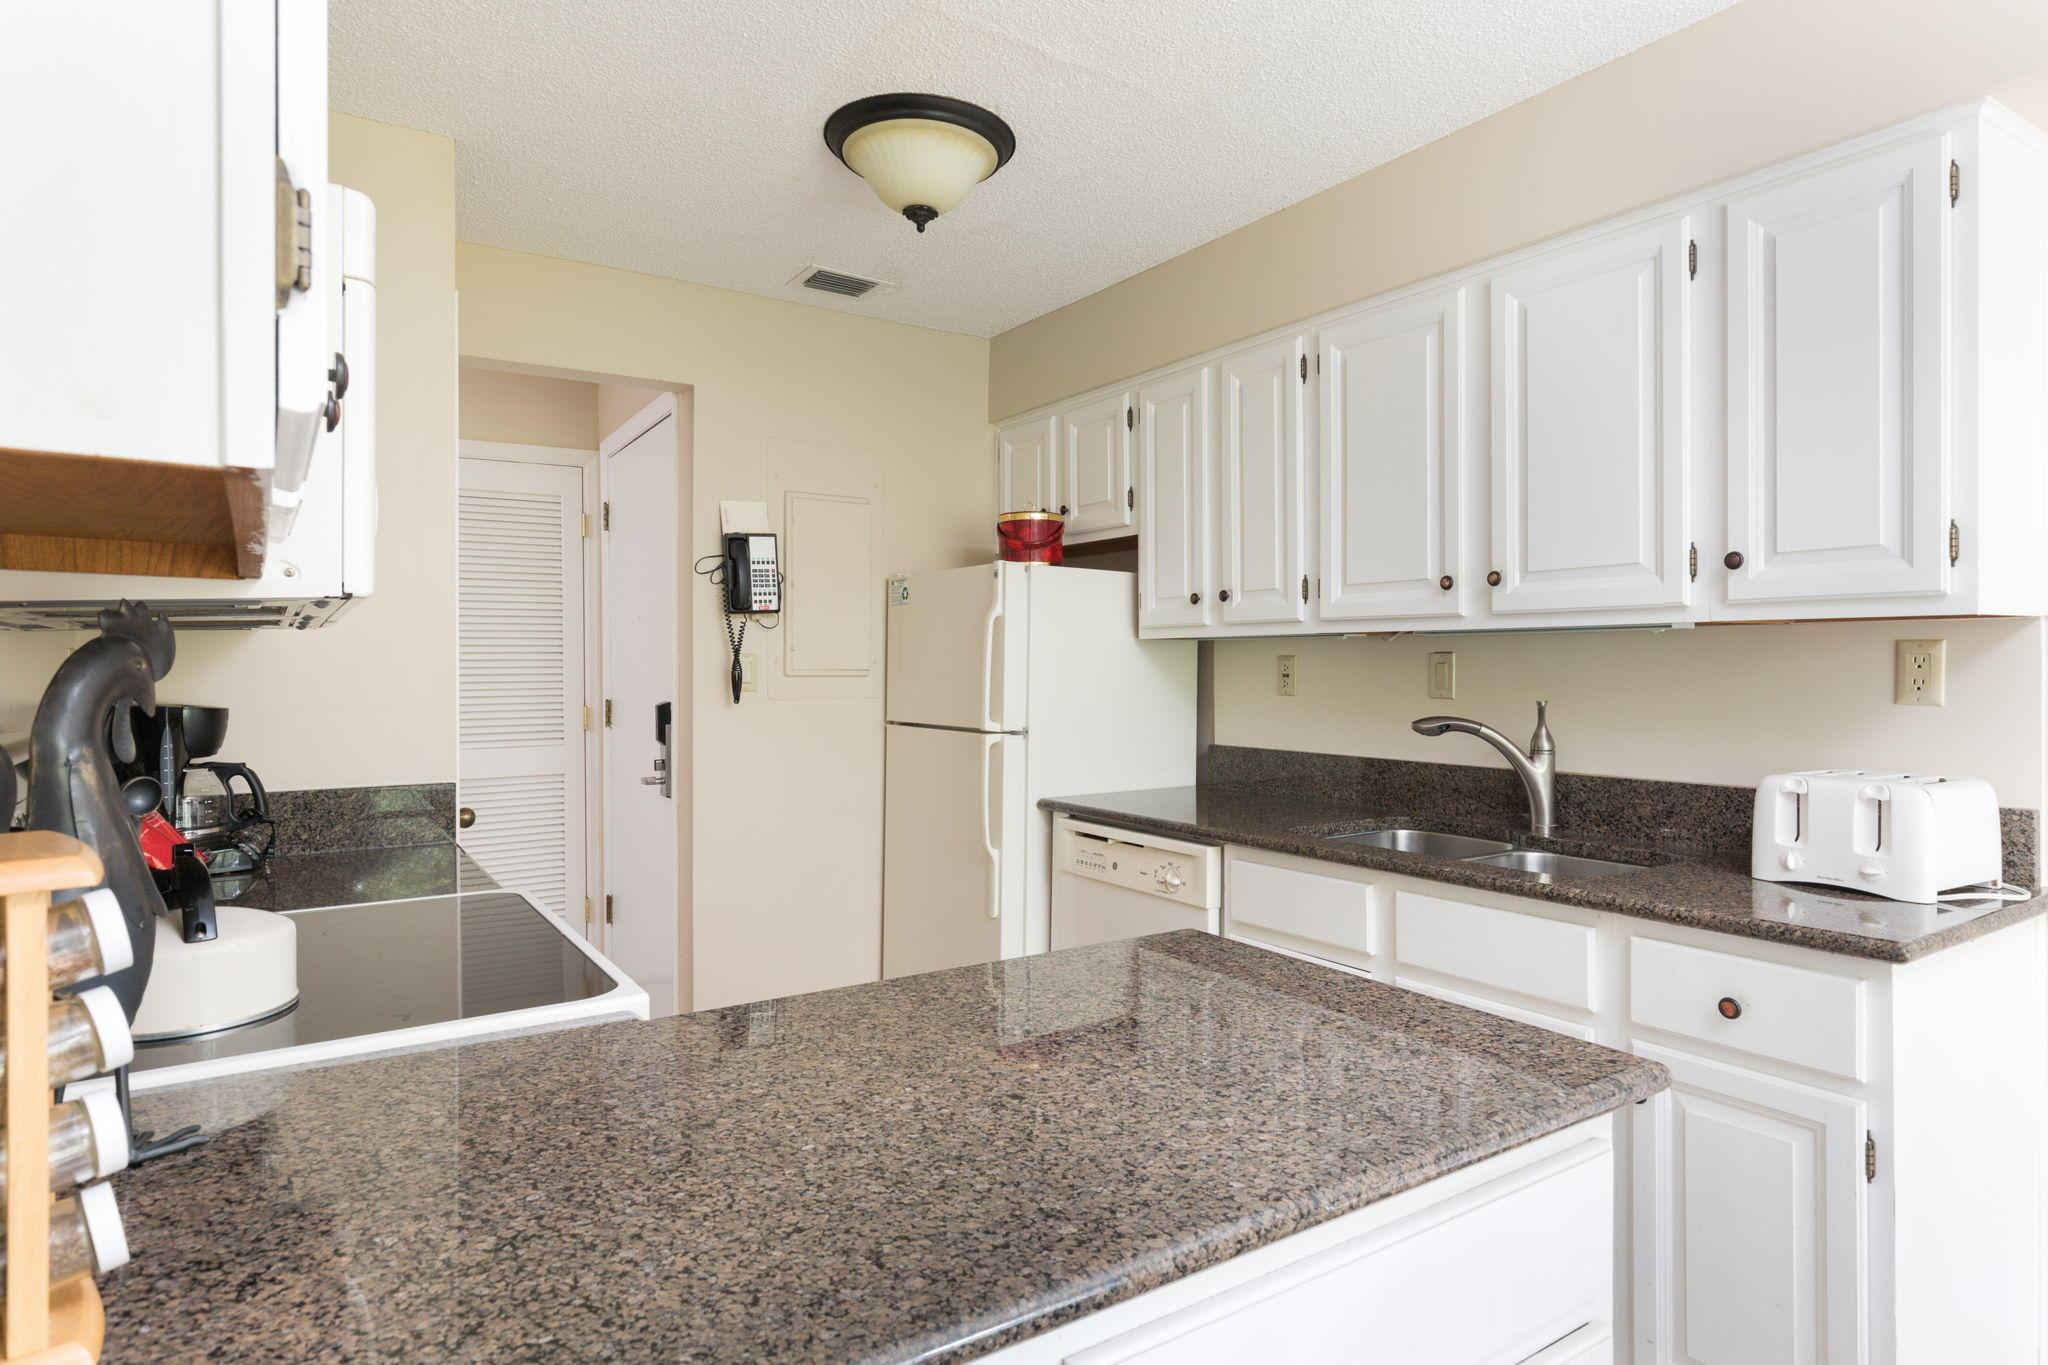 Kiawah Island Homes For Sale - 5534 Green Dolphin, Kiawah Island, SC - 45